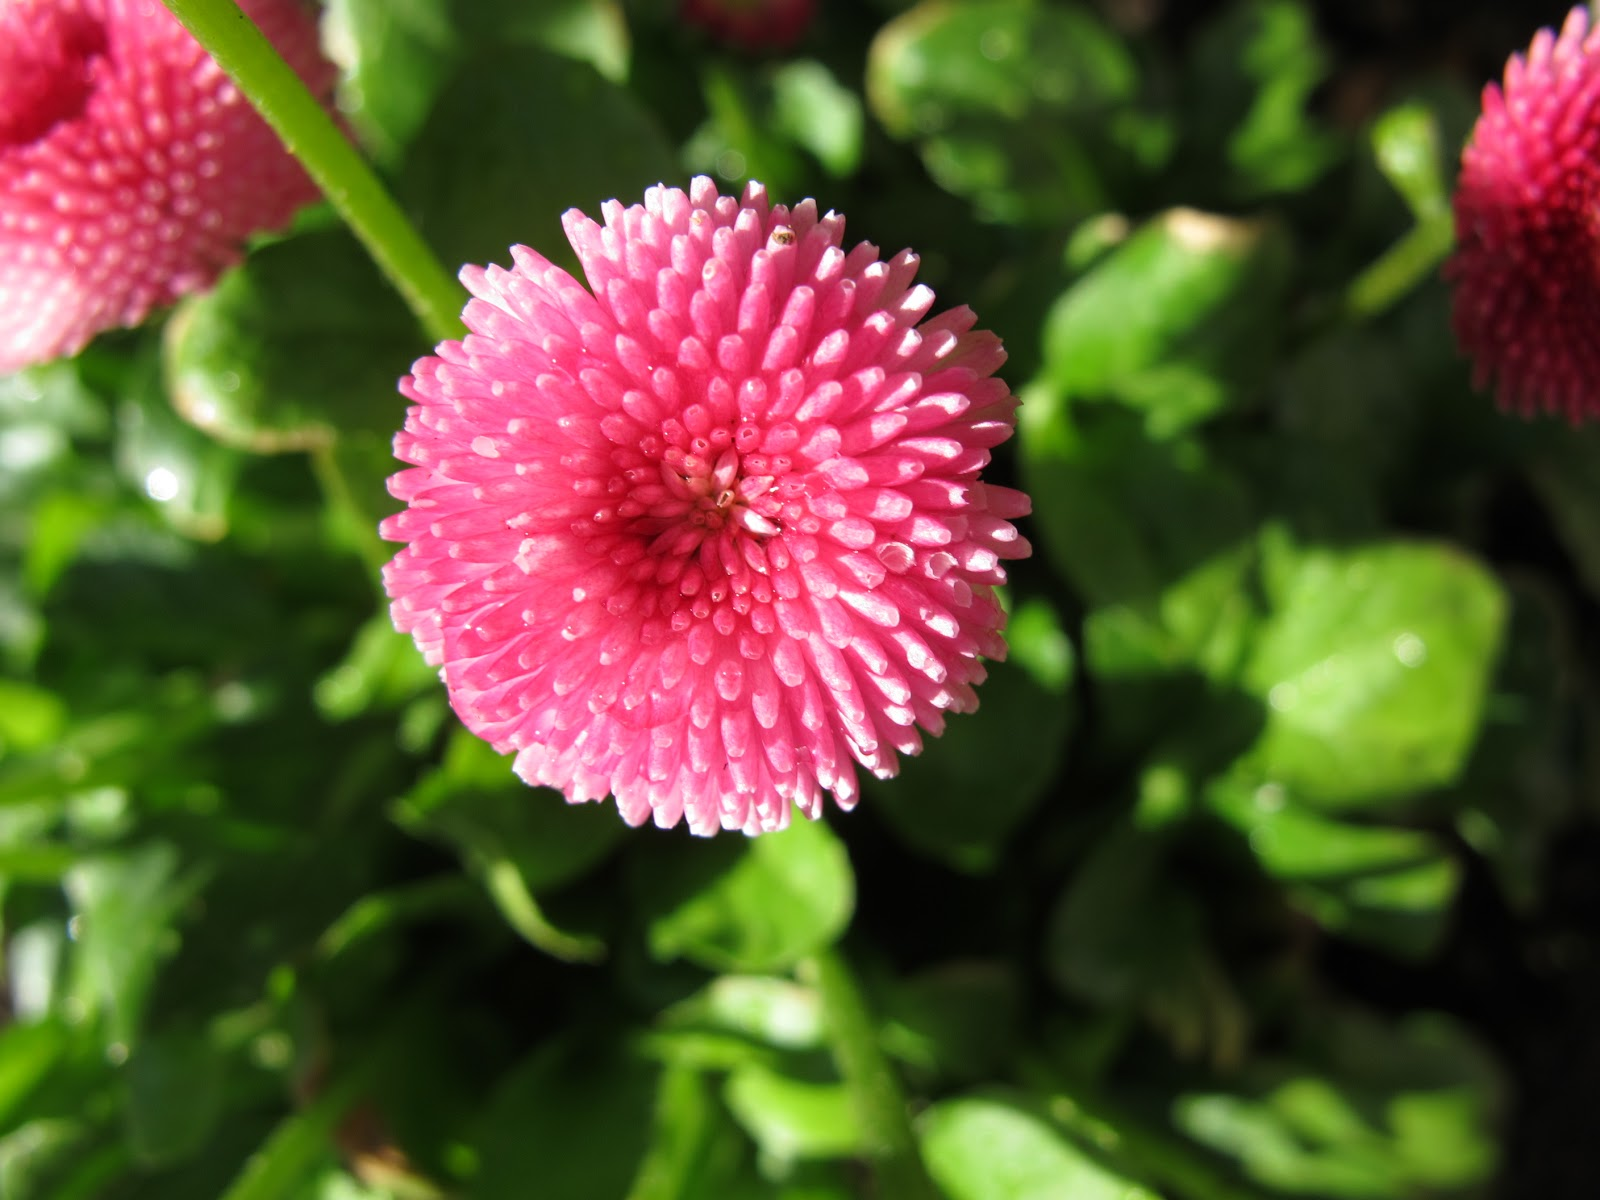 Addicted to making english daisies flower looms king henry viii english daisies izmirmasajfo